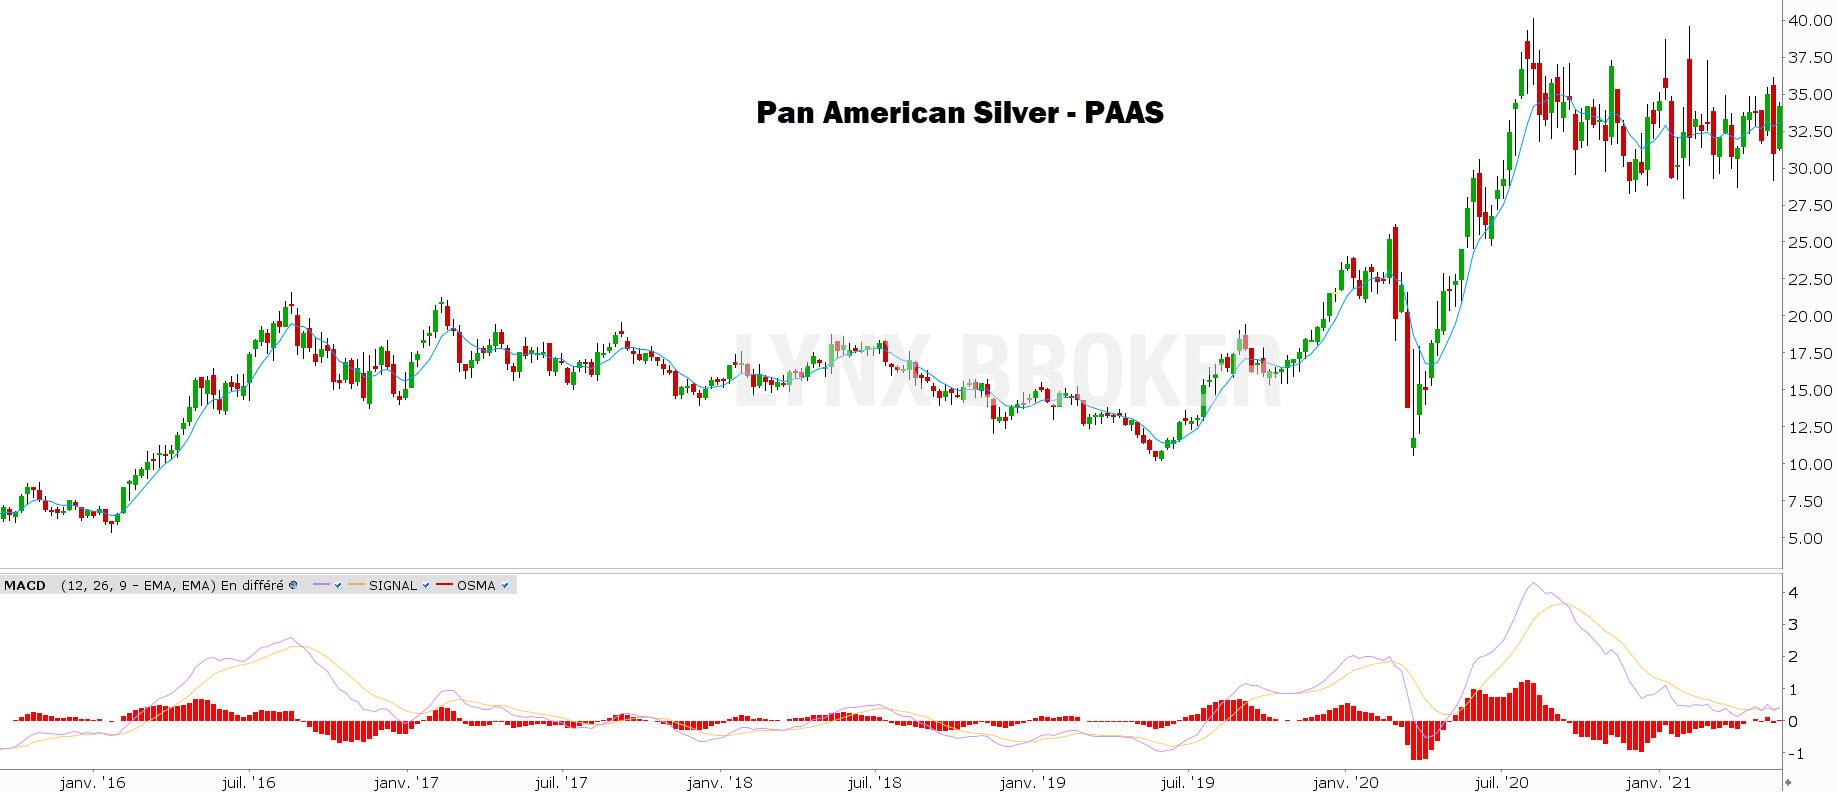 investir dans l'argent pan american silver